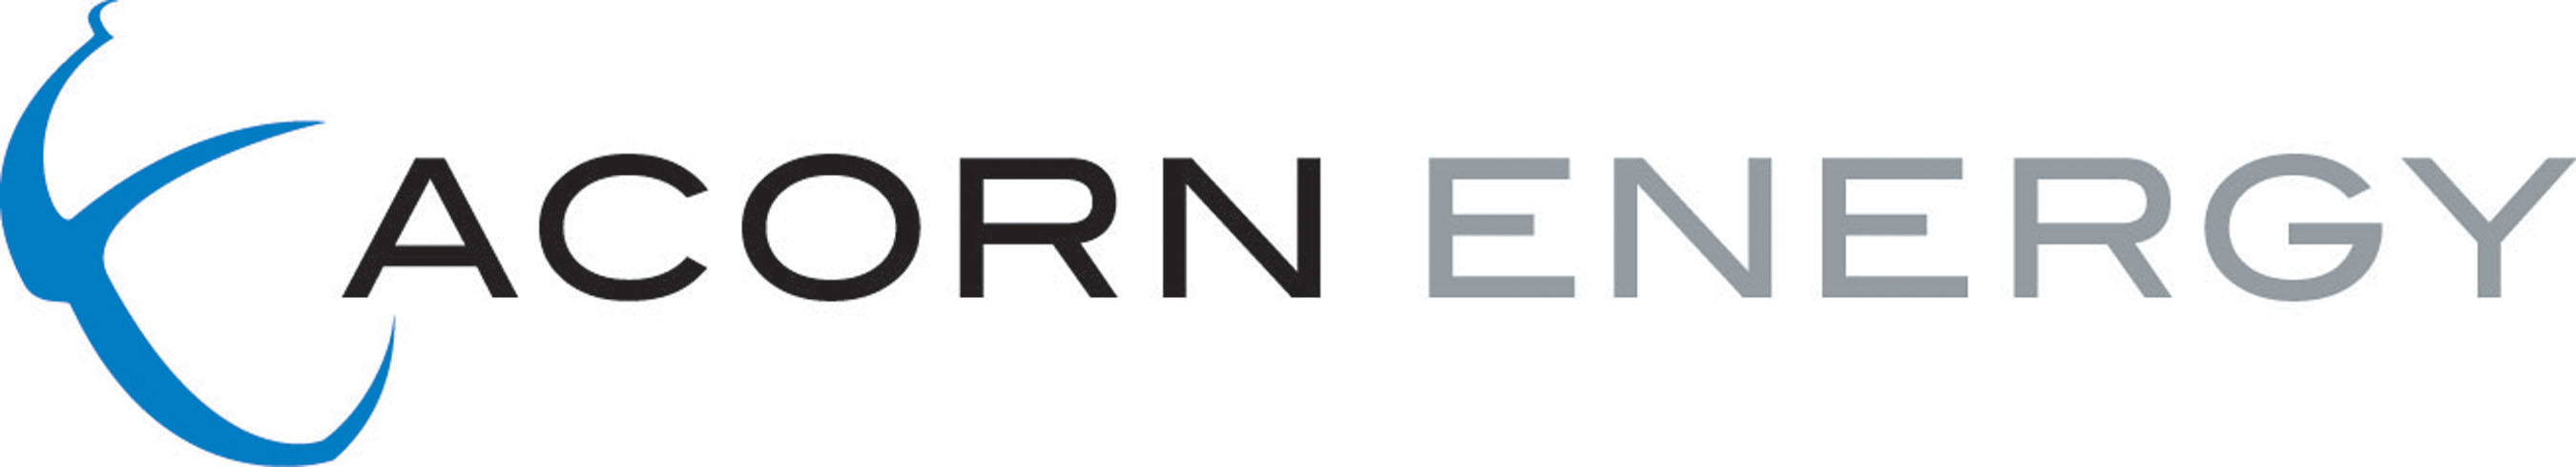 Acorn Energy Logo.